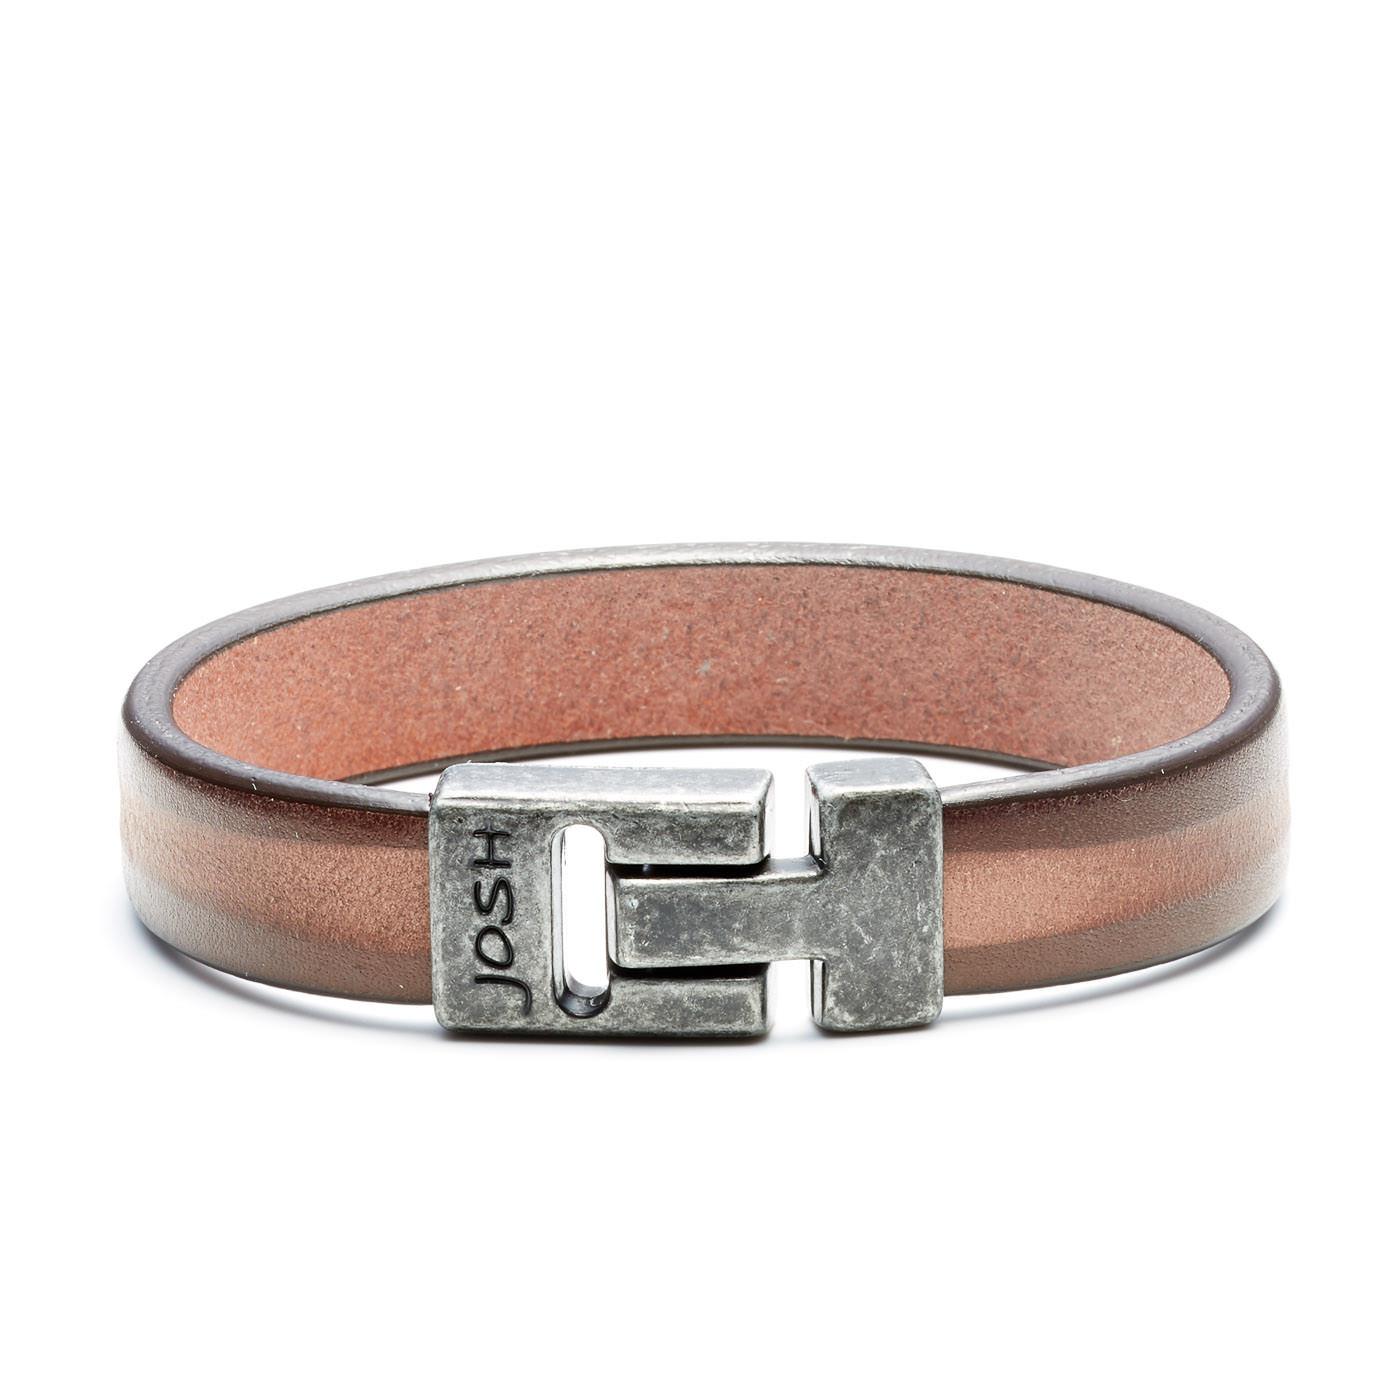 Josh Vintage Black/Brown Armband 24798-BRA-VB/BROWN (Lengte: 20.50-22.50 cm)